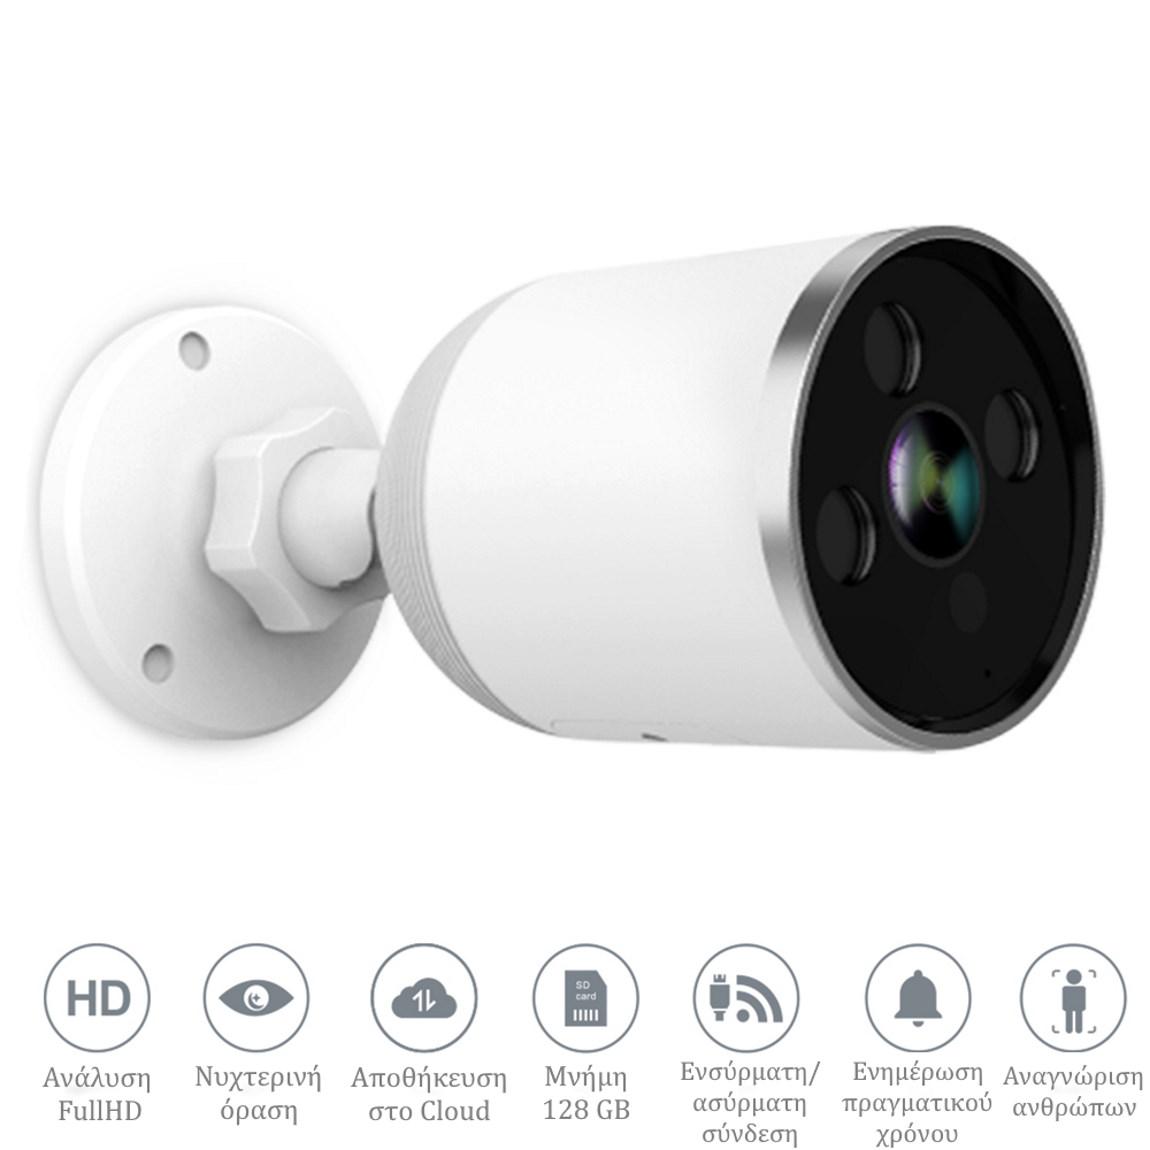 Clever Dog κάμερα ασφαλείας χαρακτηριστικά